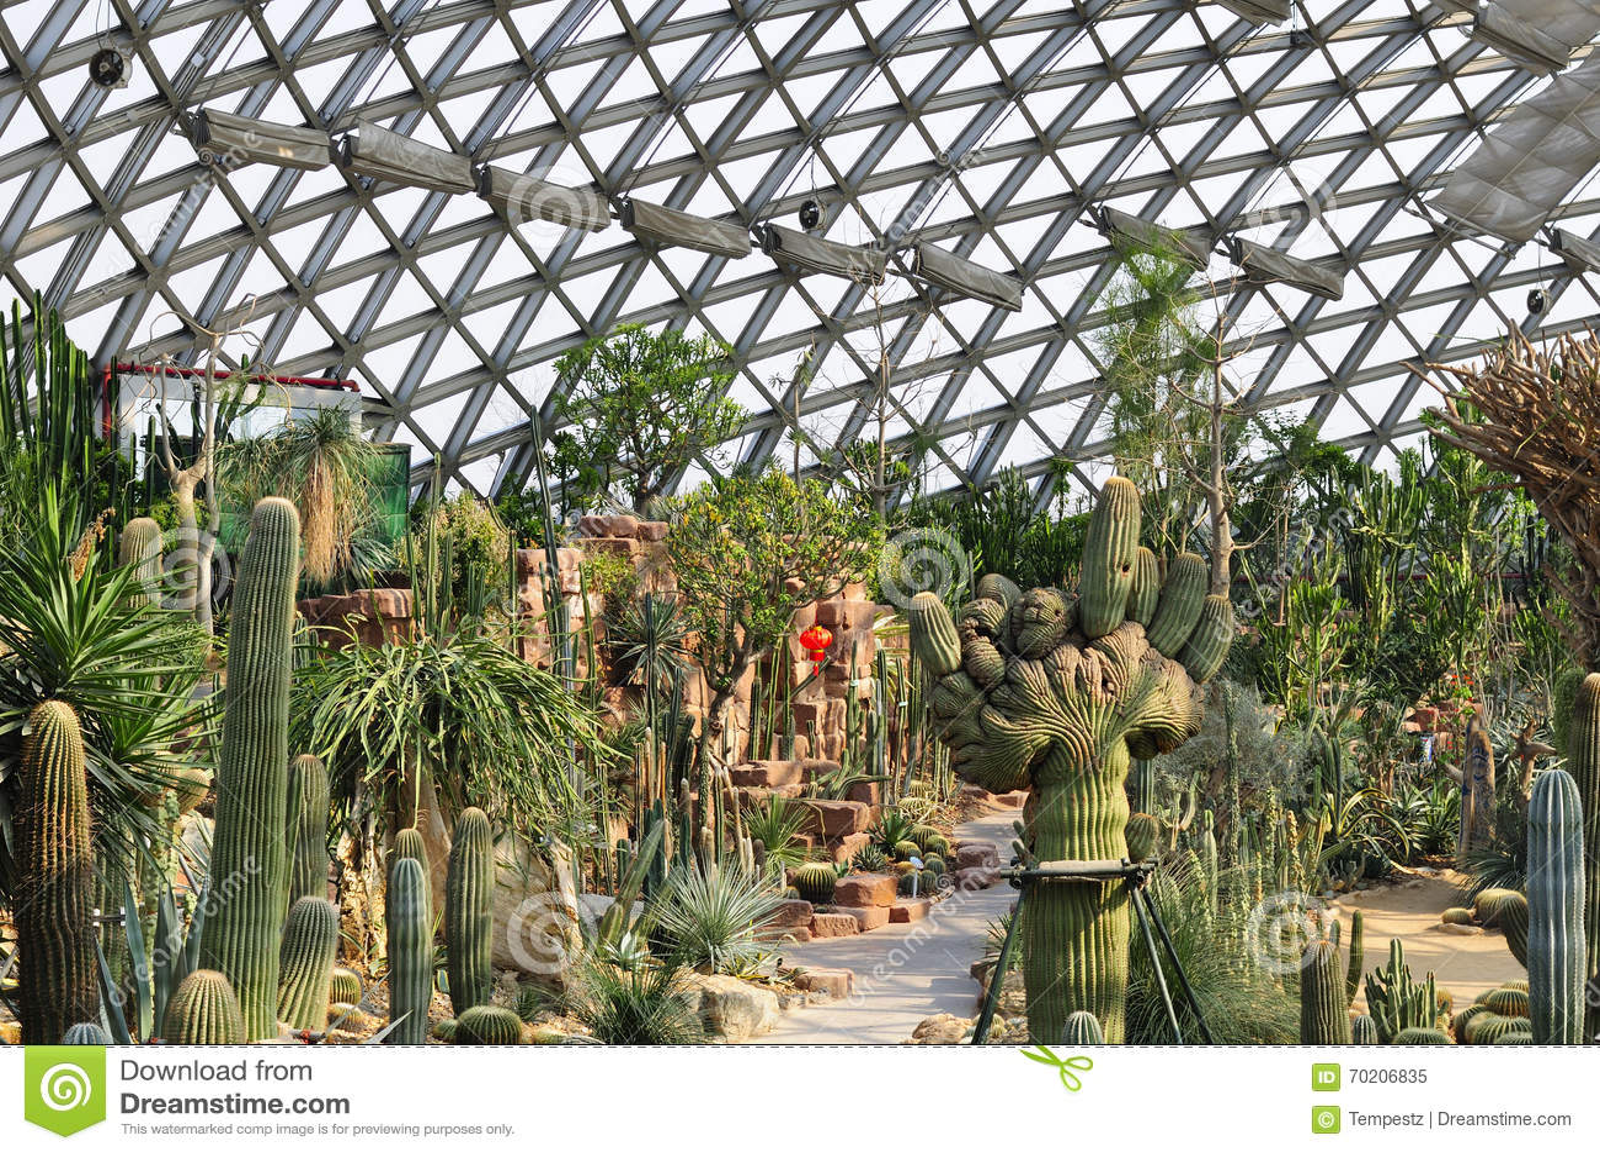 Fabulous Chenshan Botanical Garden Desert Greenhouse Stock Image Home Interior And Landscaping Oversignezvosmurscom